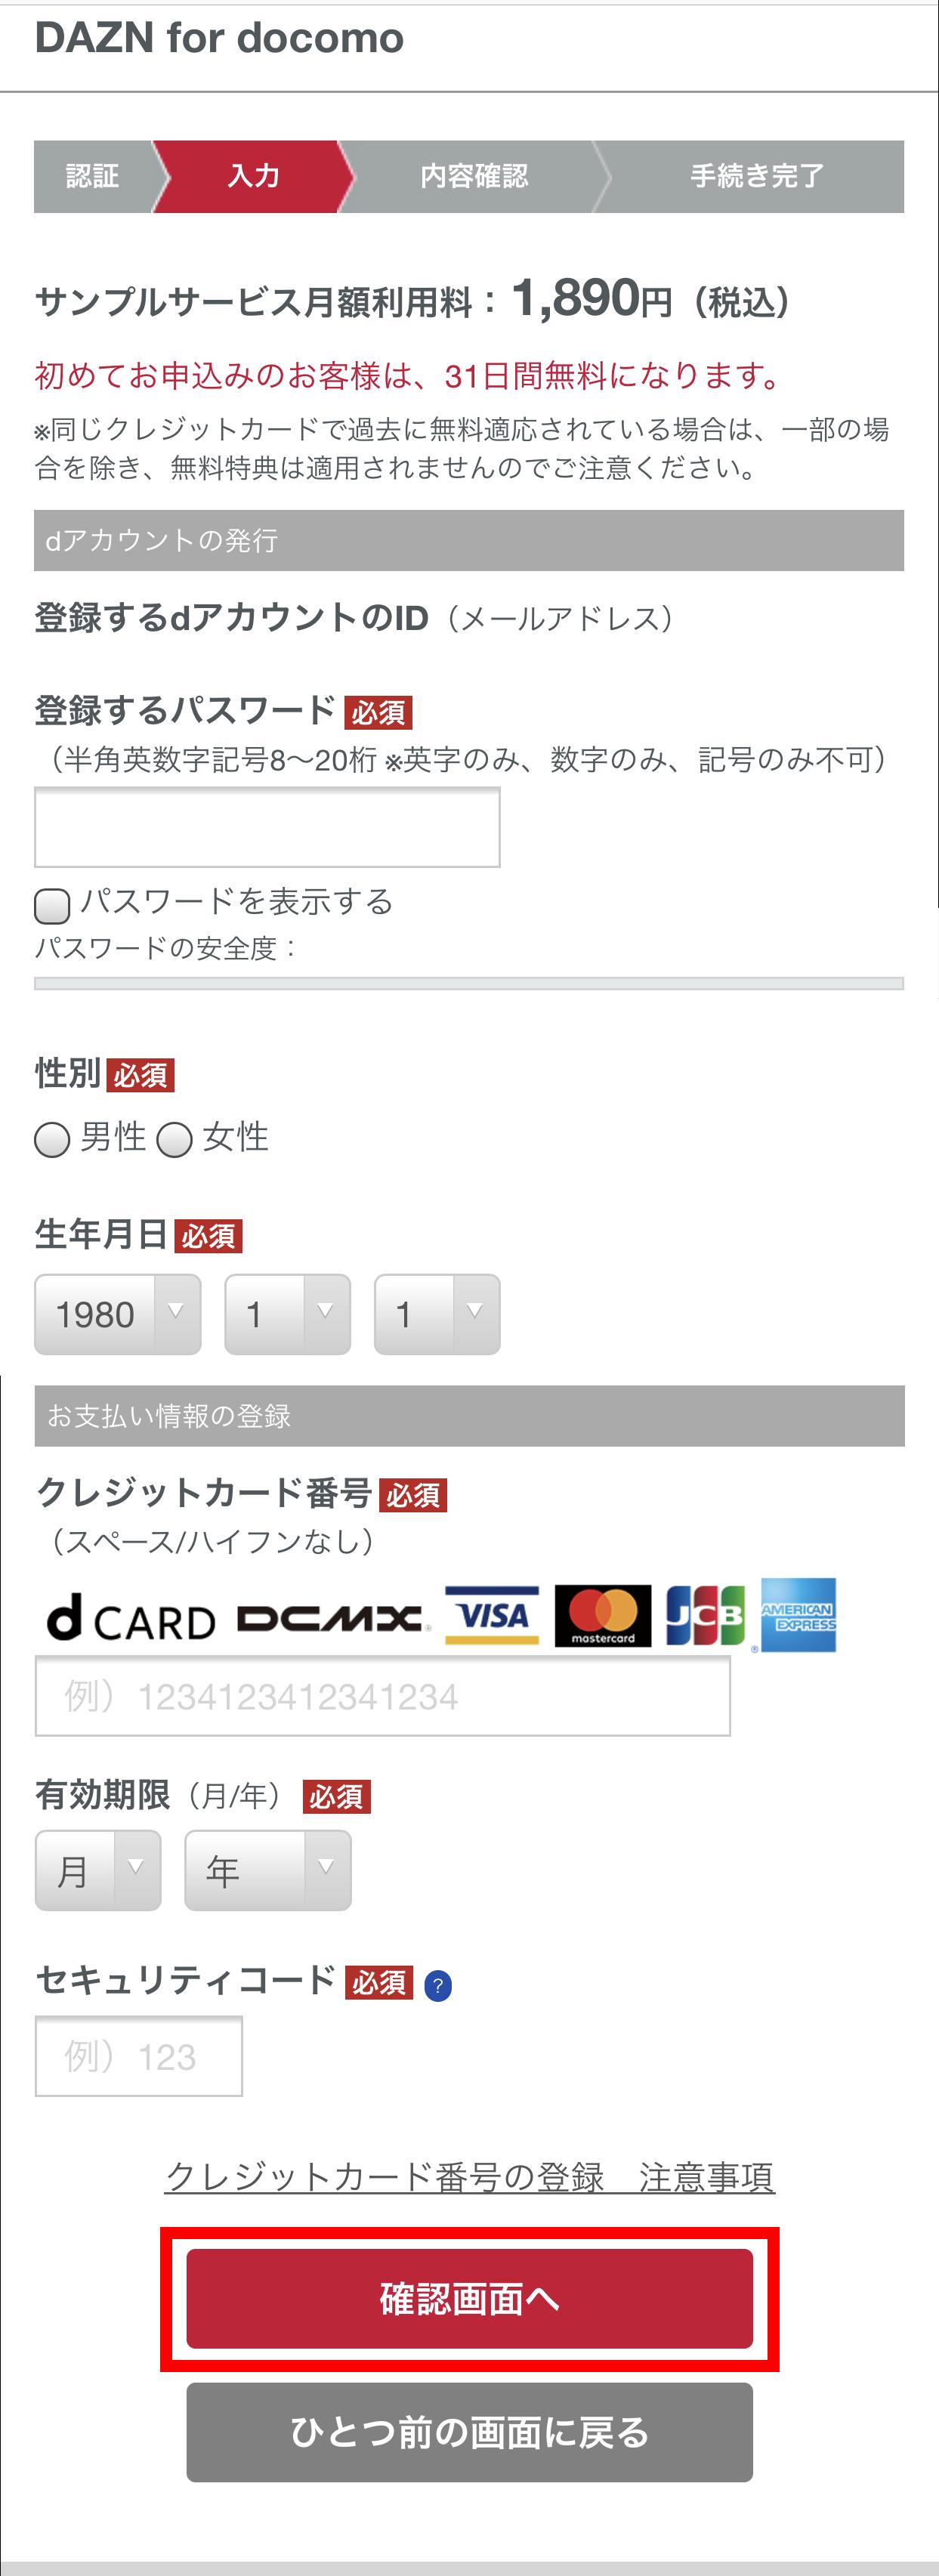 dアカウント情報とクレジットカード情報を入力